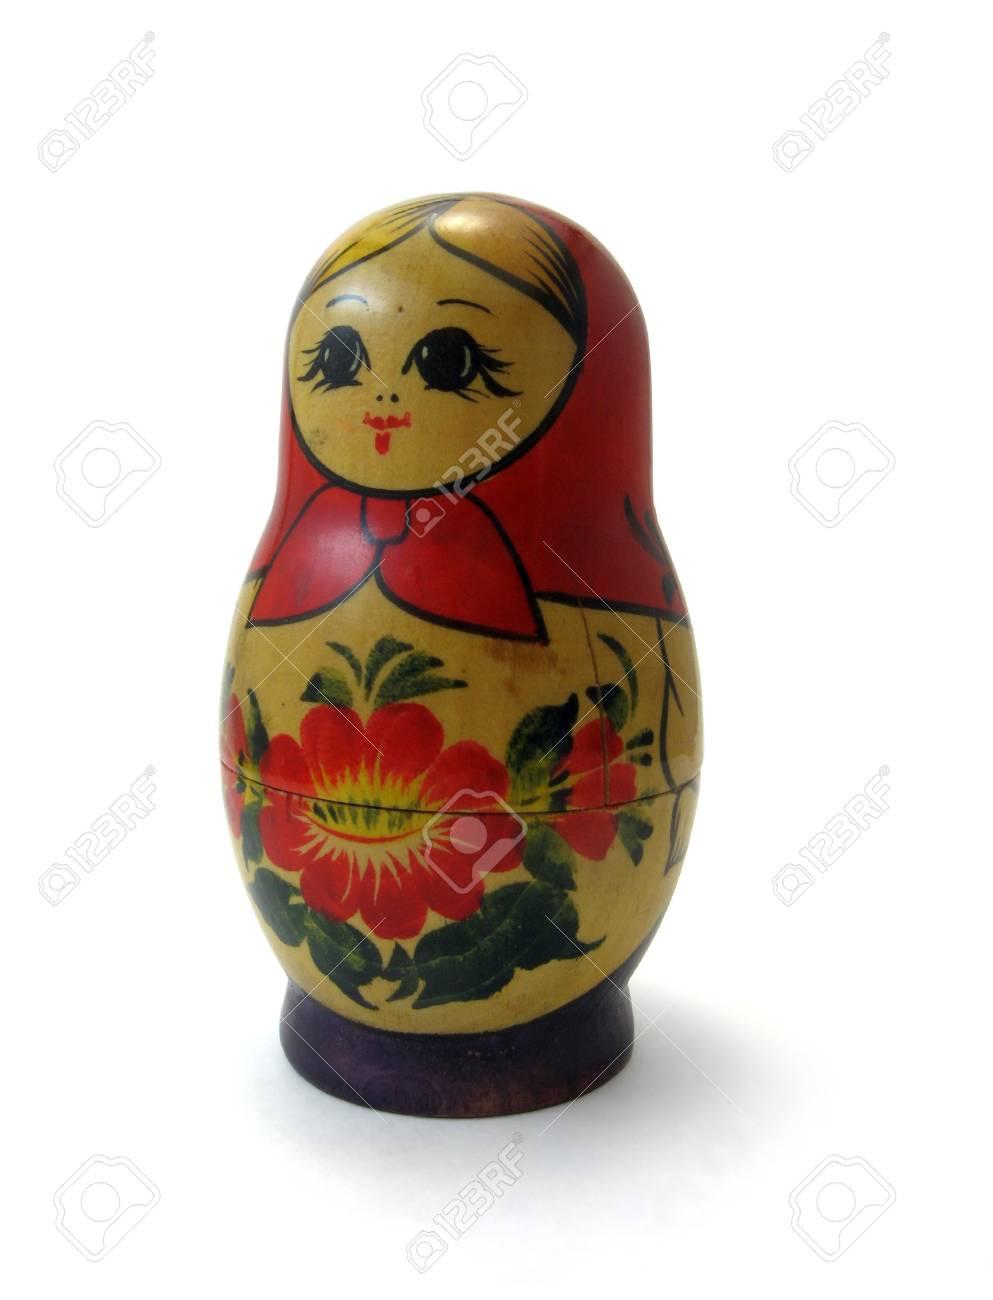 Russian nesting dolls Stock Photo - 13953806